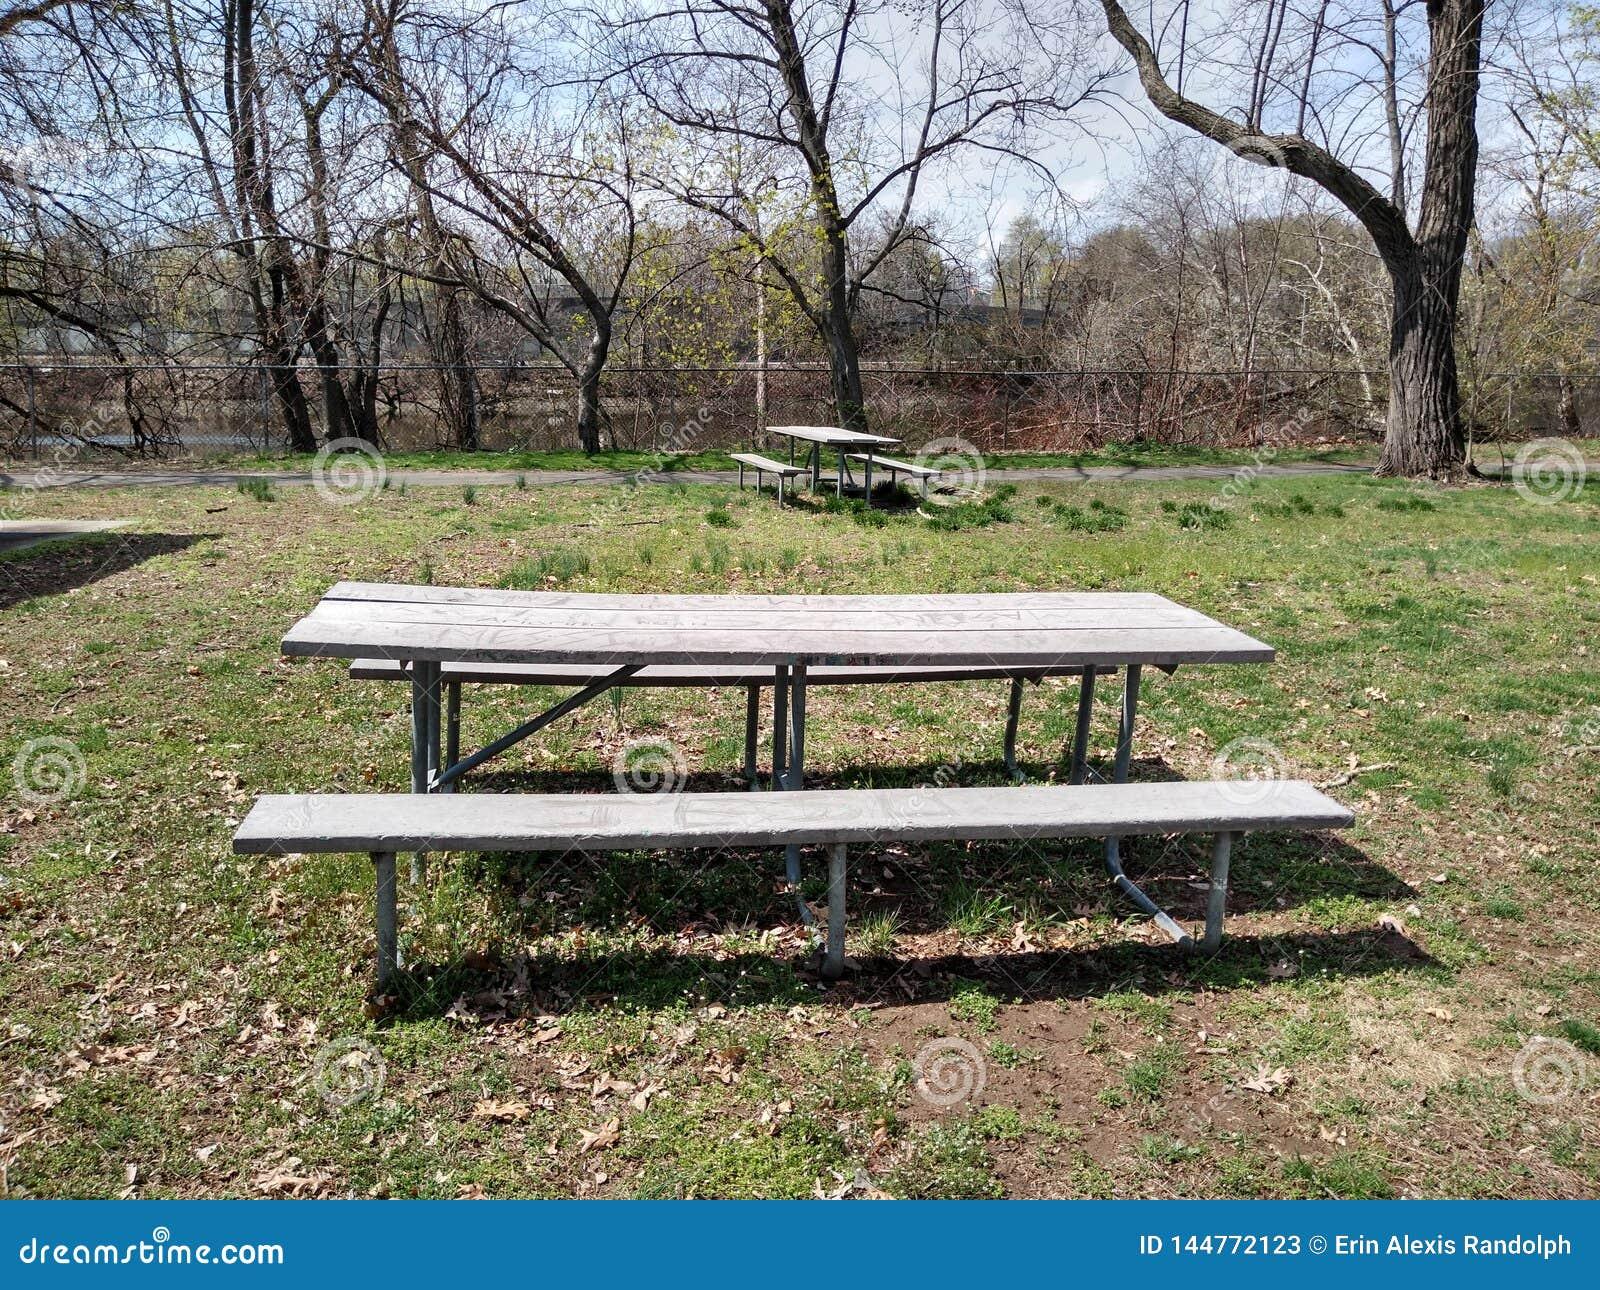 Área de picnic en un parque público, Rutherford, NJ, los E.E.U.U.